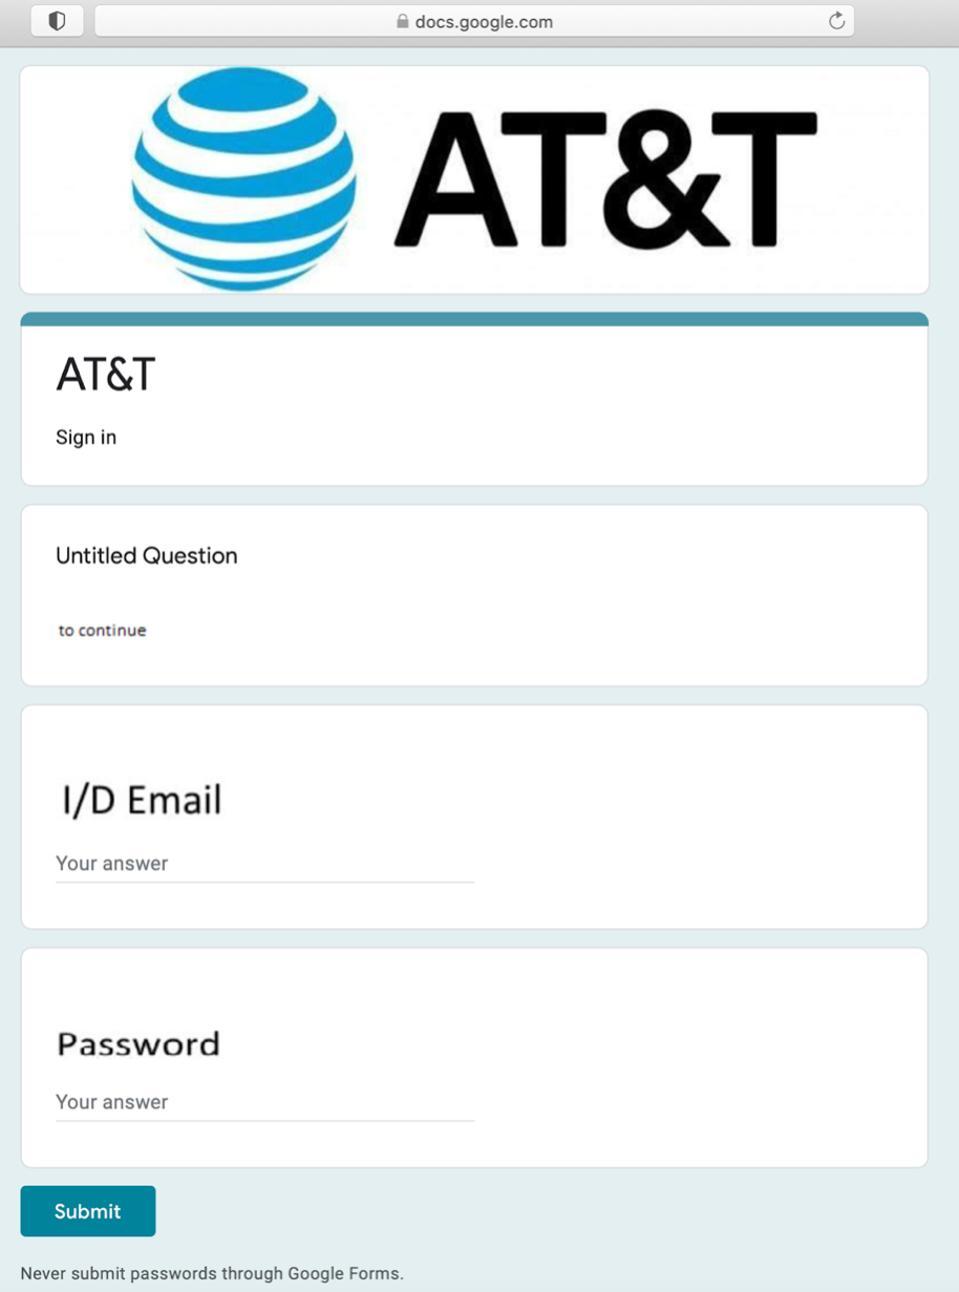 A malicious Google Form